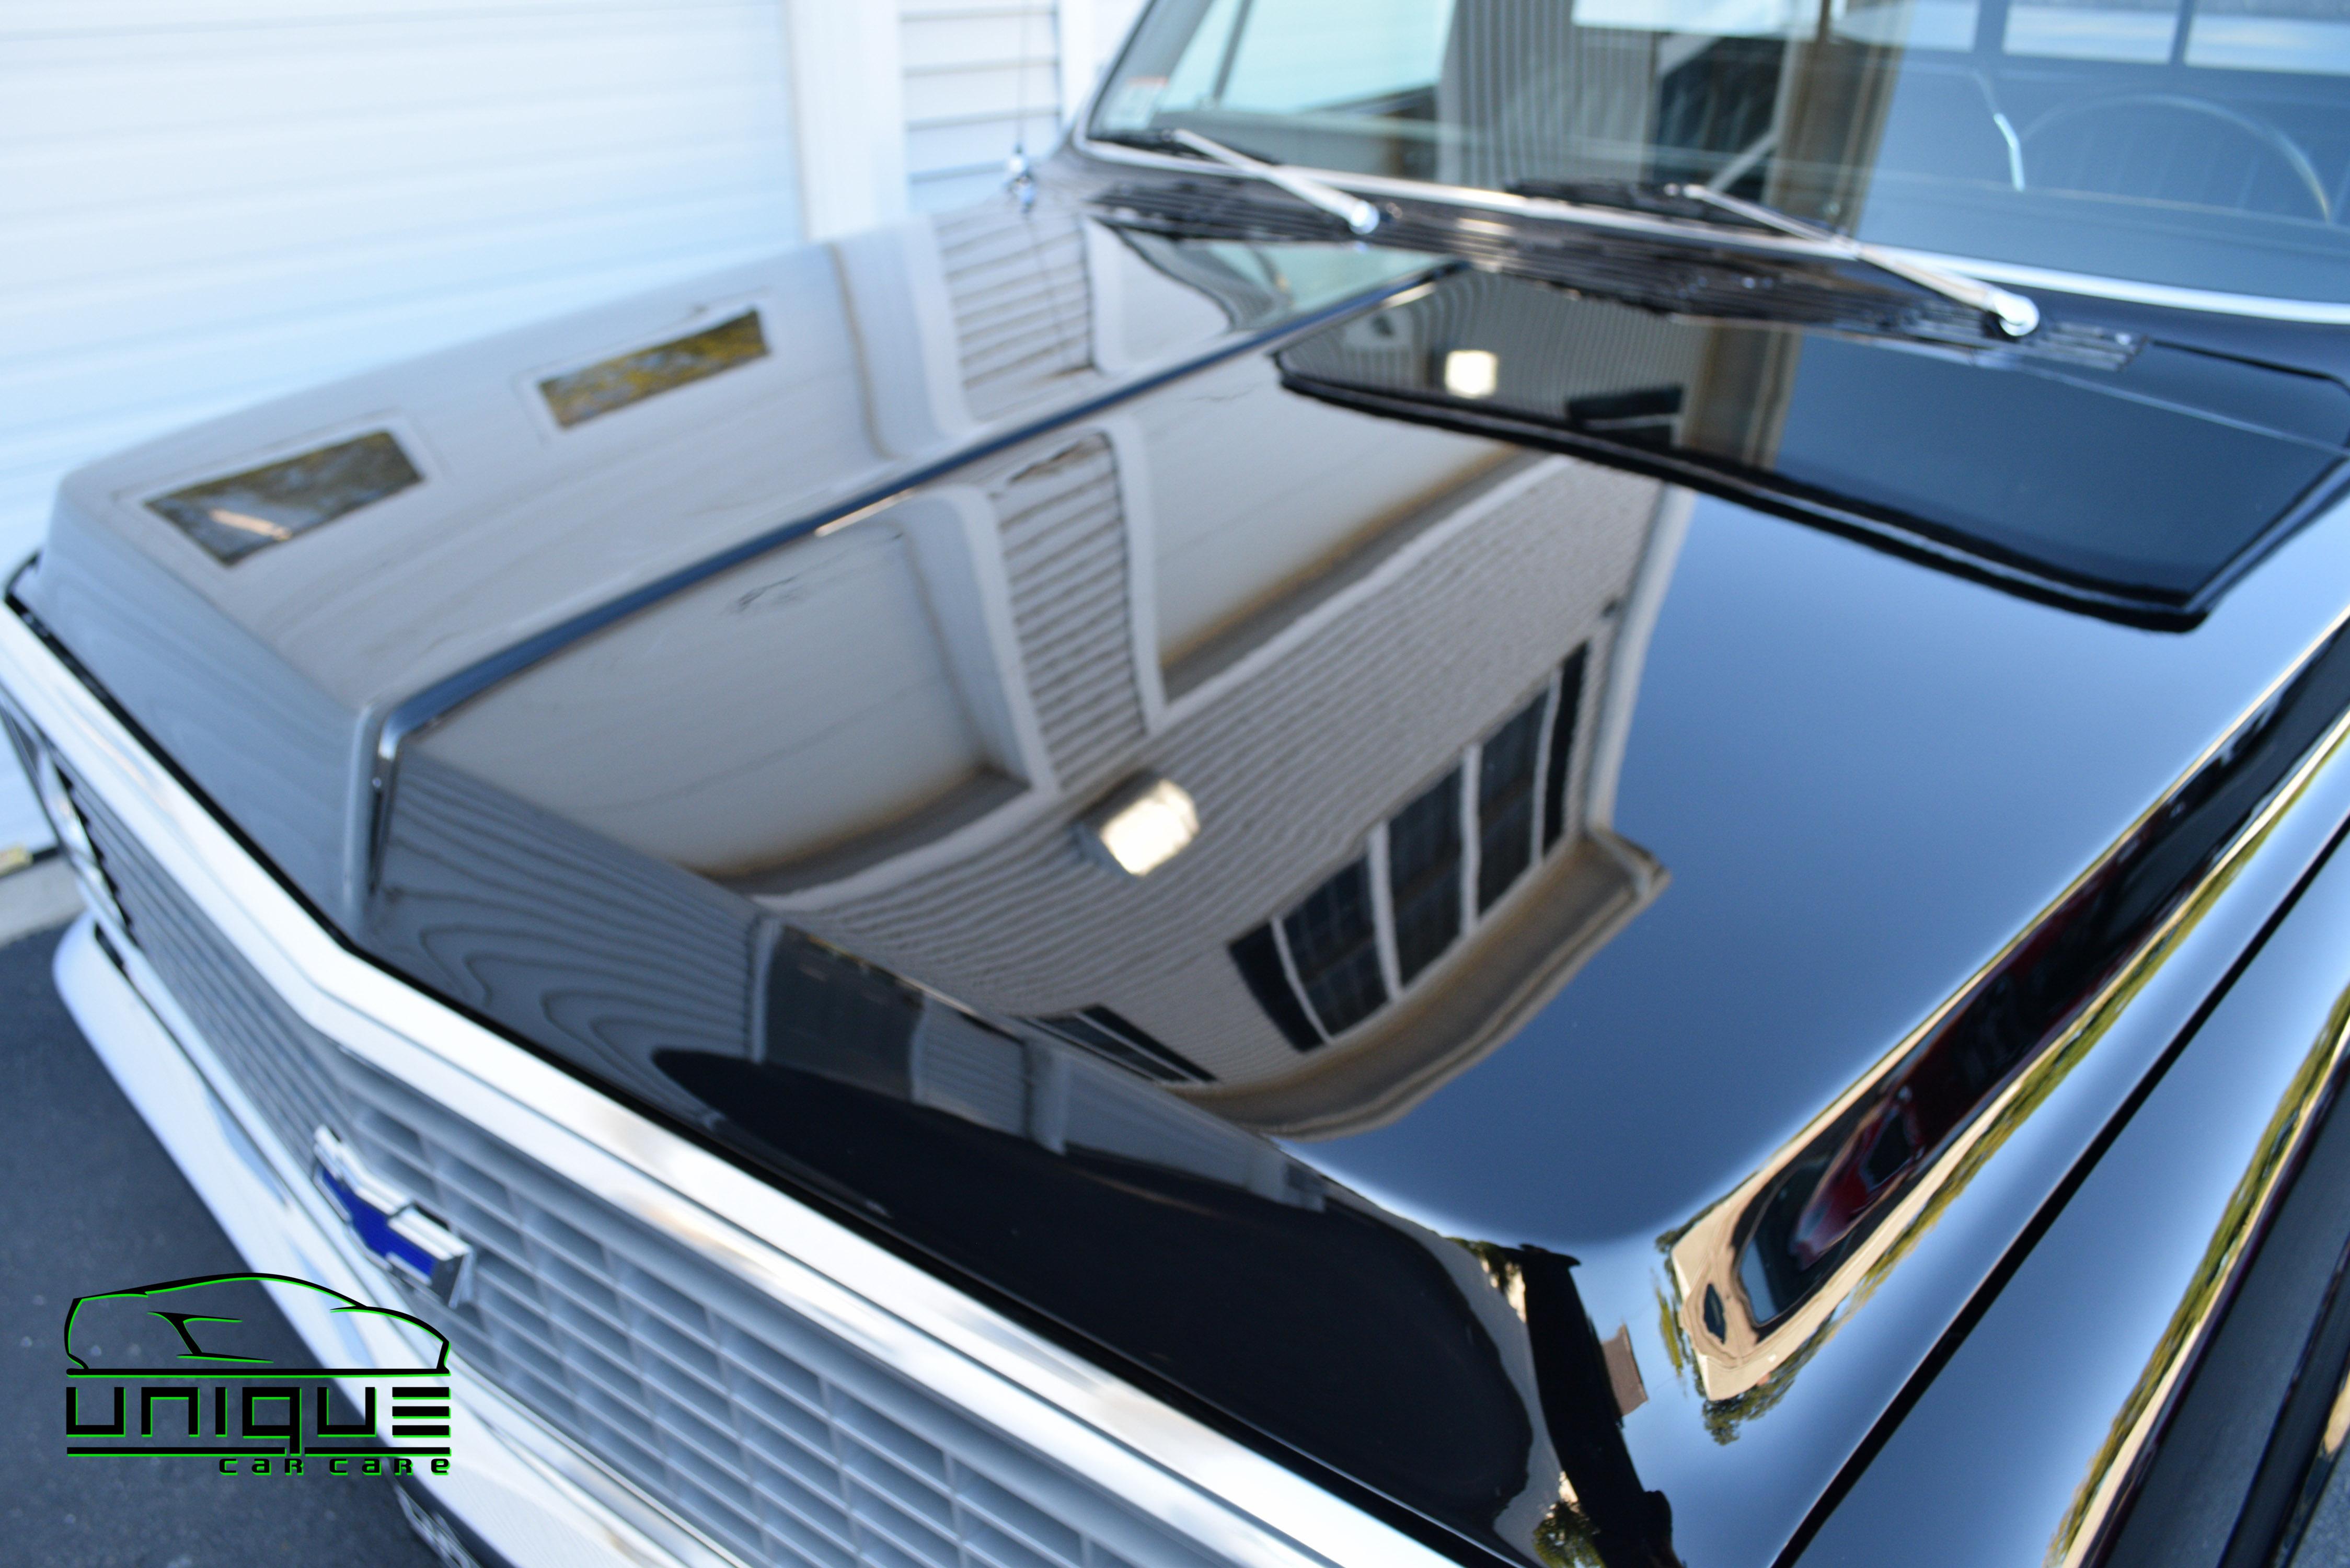 UCC_Custom 72' Chevy Pick up-66